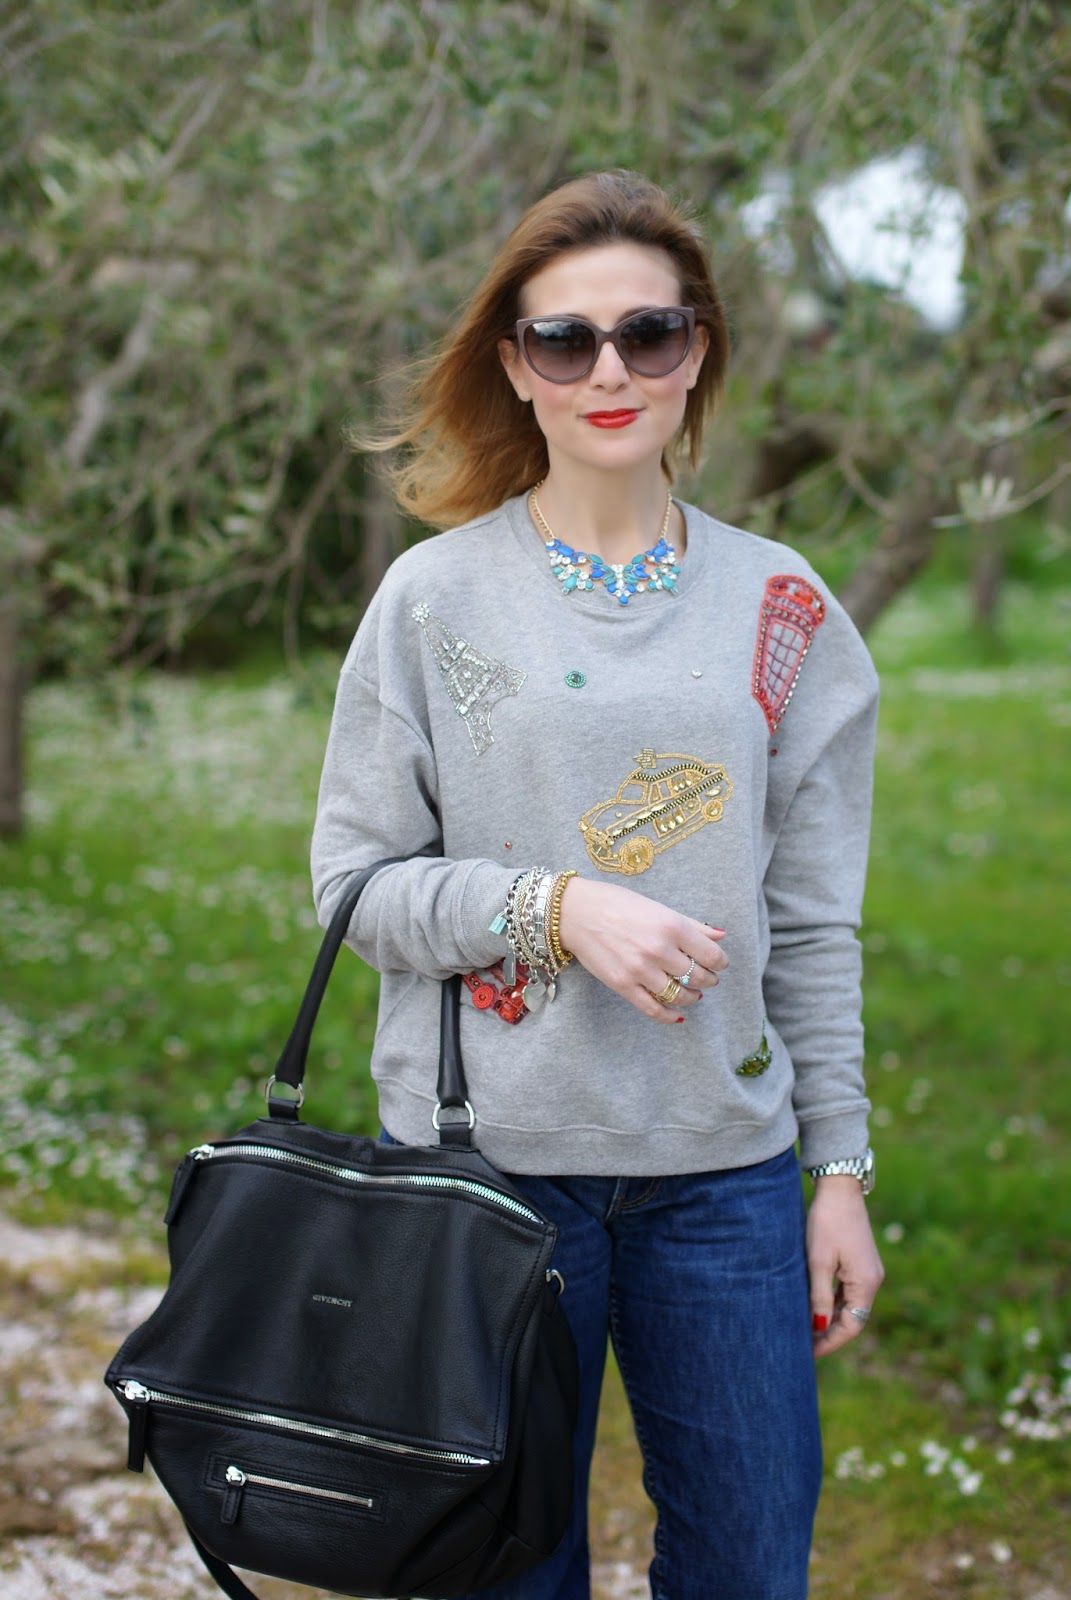 Givenchy Pandora grande, Zara embroidered sweatshirt, Fashion and Cookies, fashion blogger